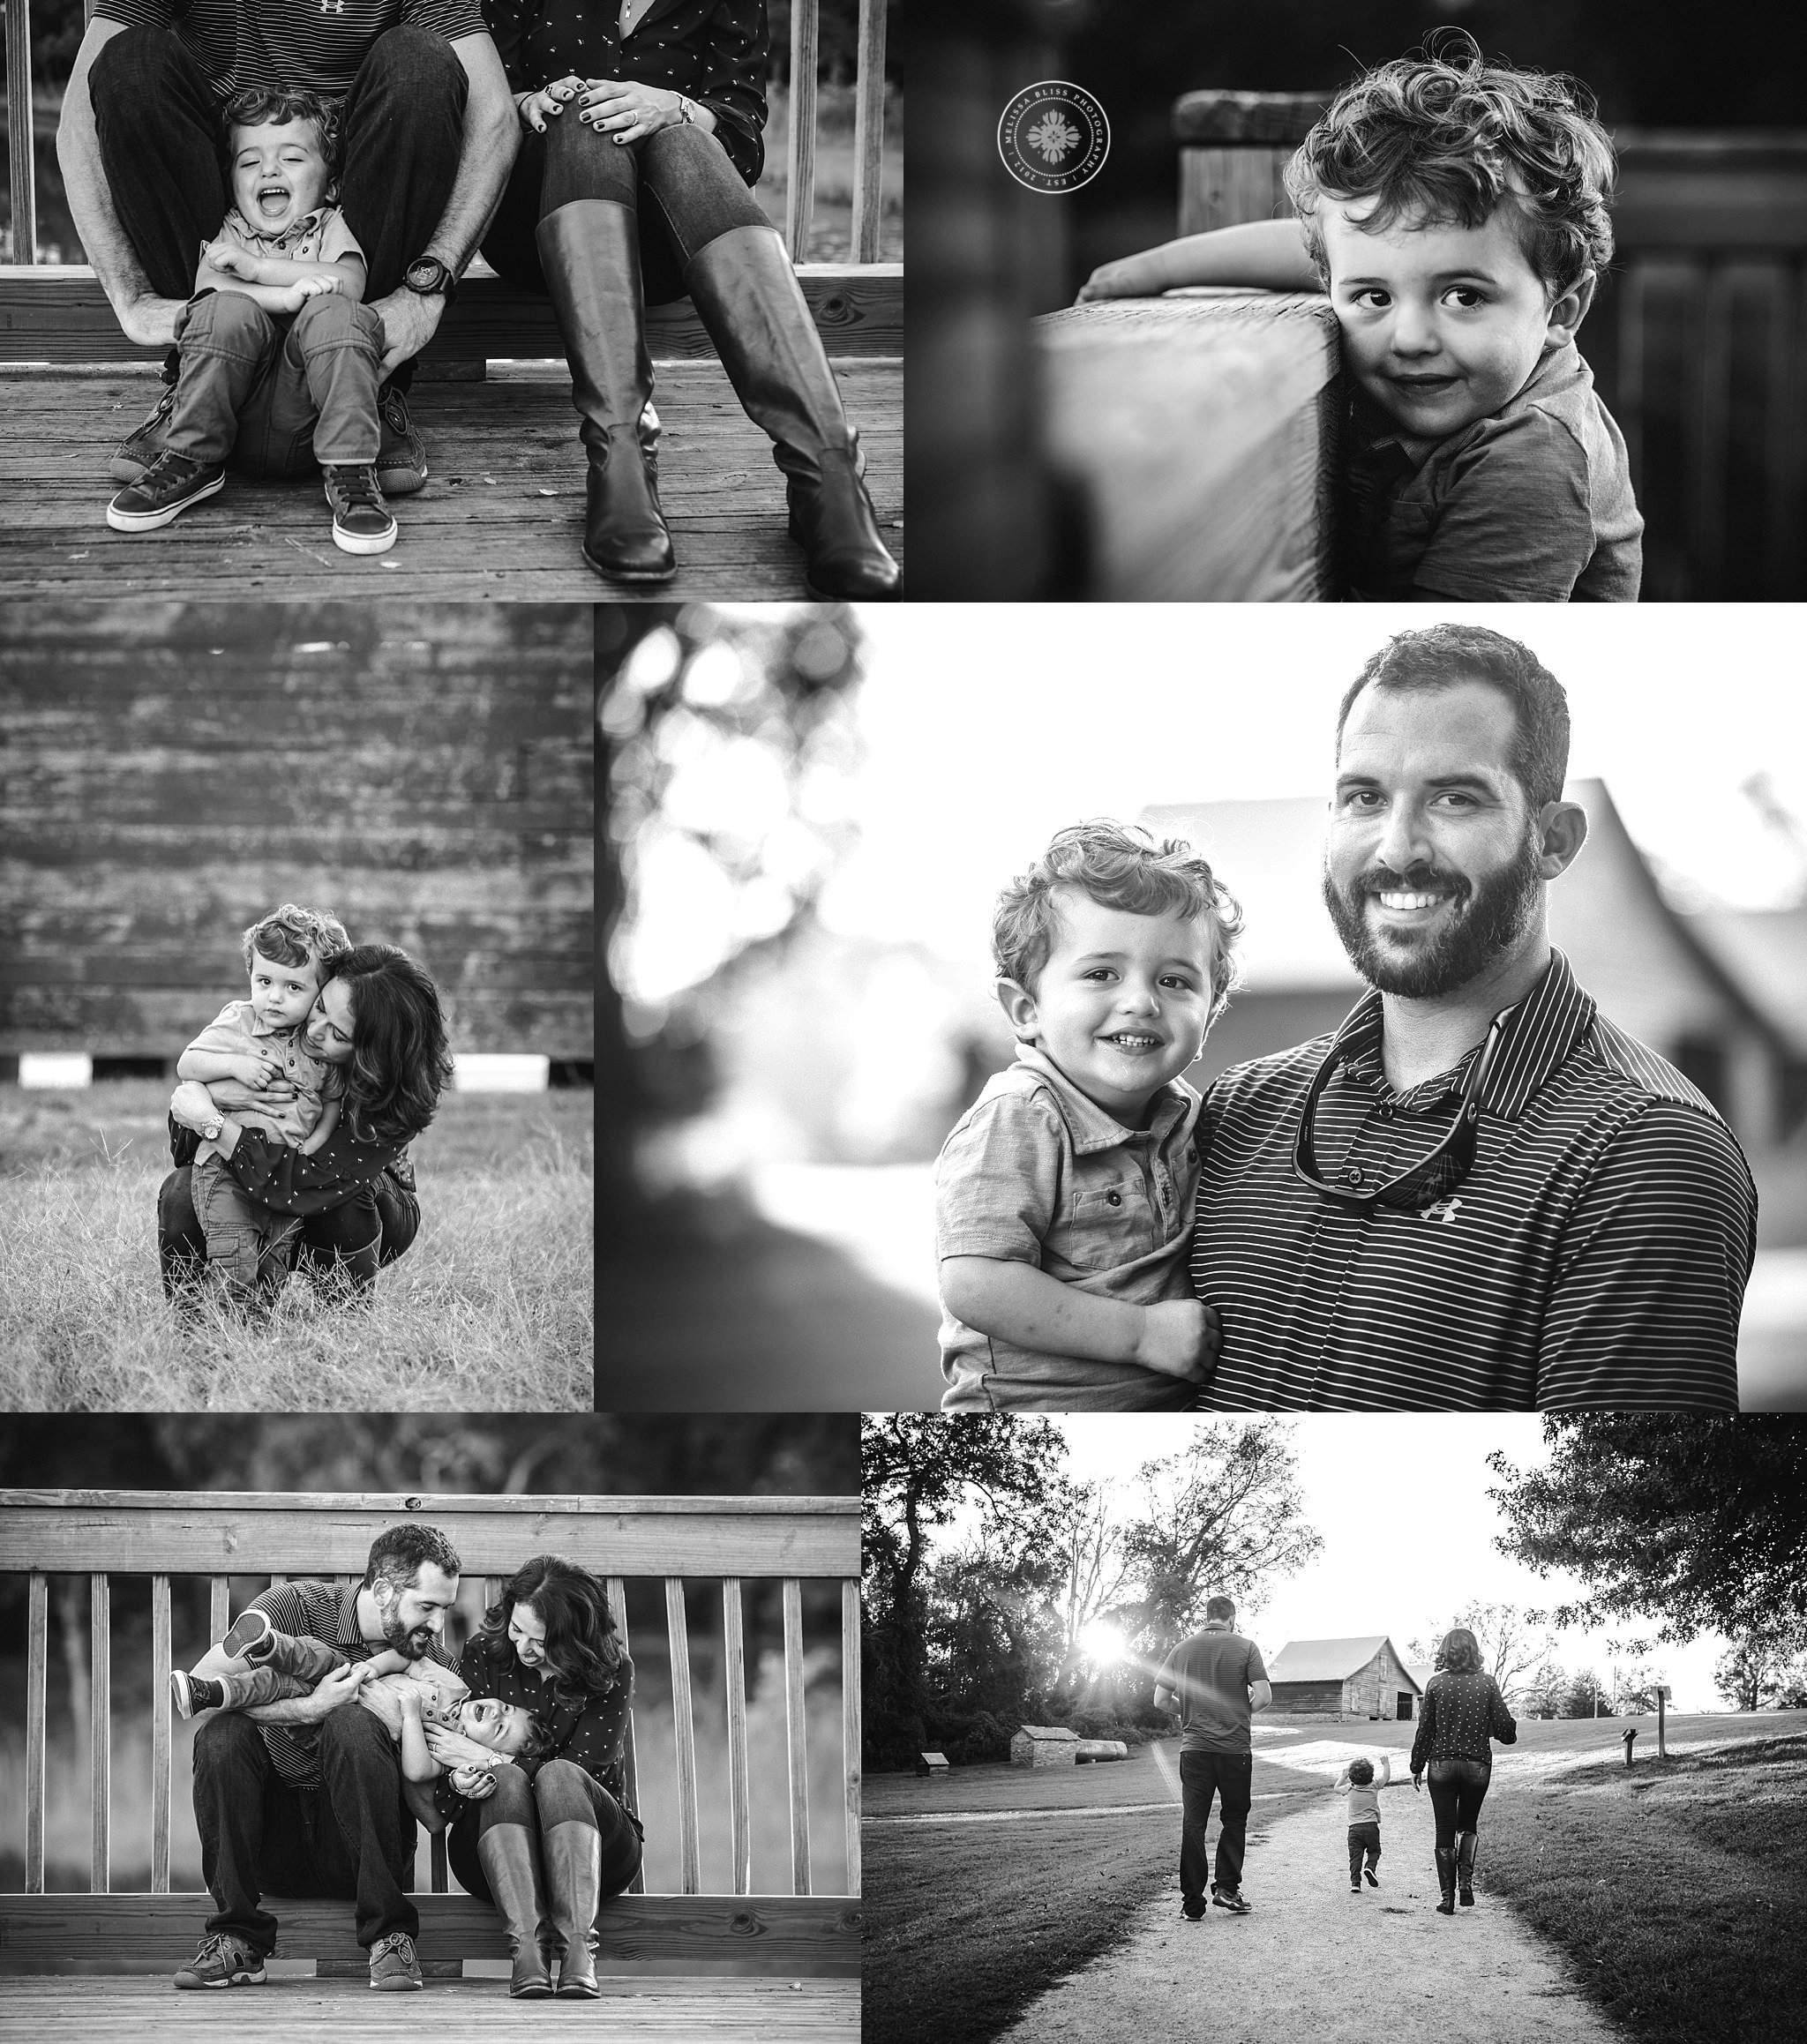 melissa-bliss-photography-virginia-beach-norfolk-chesapeake-williamsburg-family-lifestyle-photographers